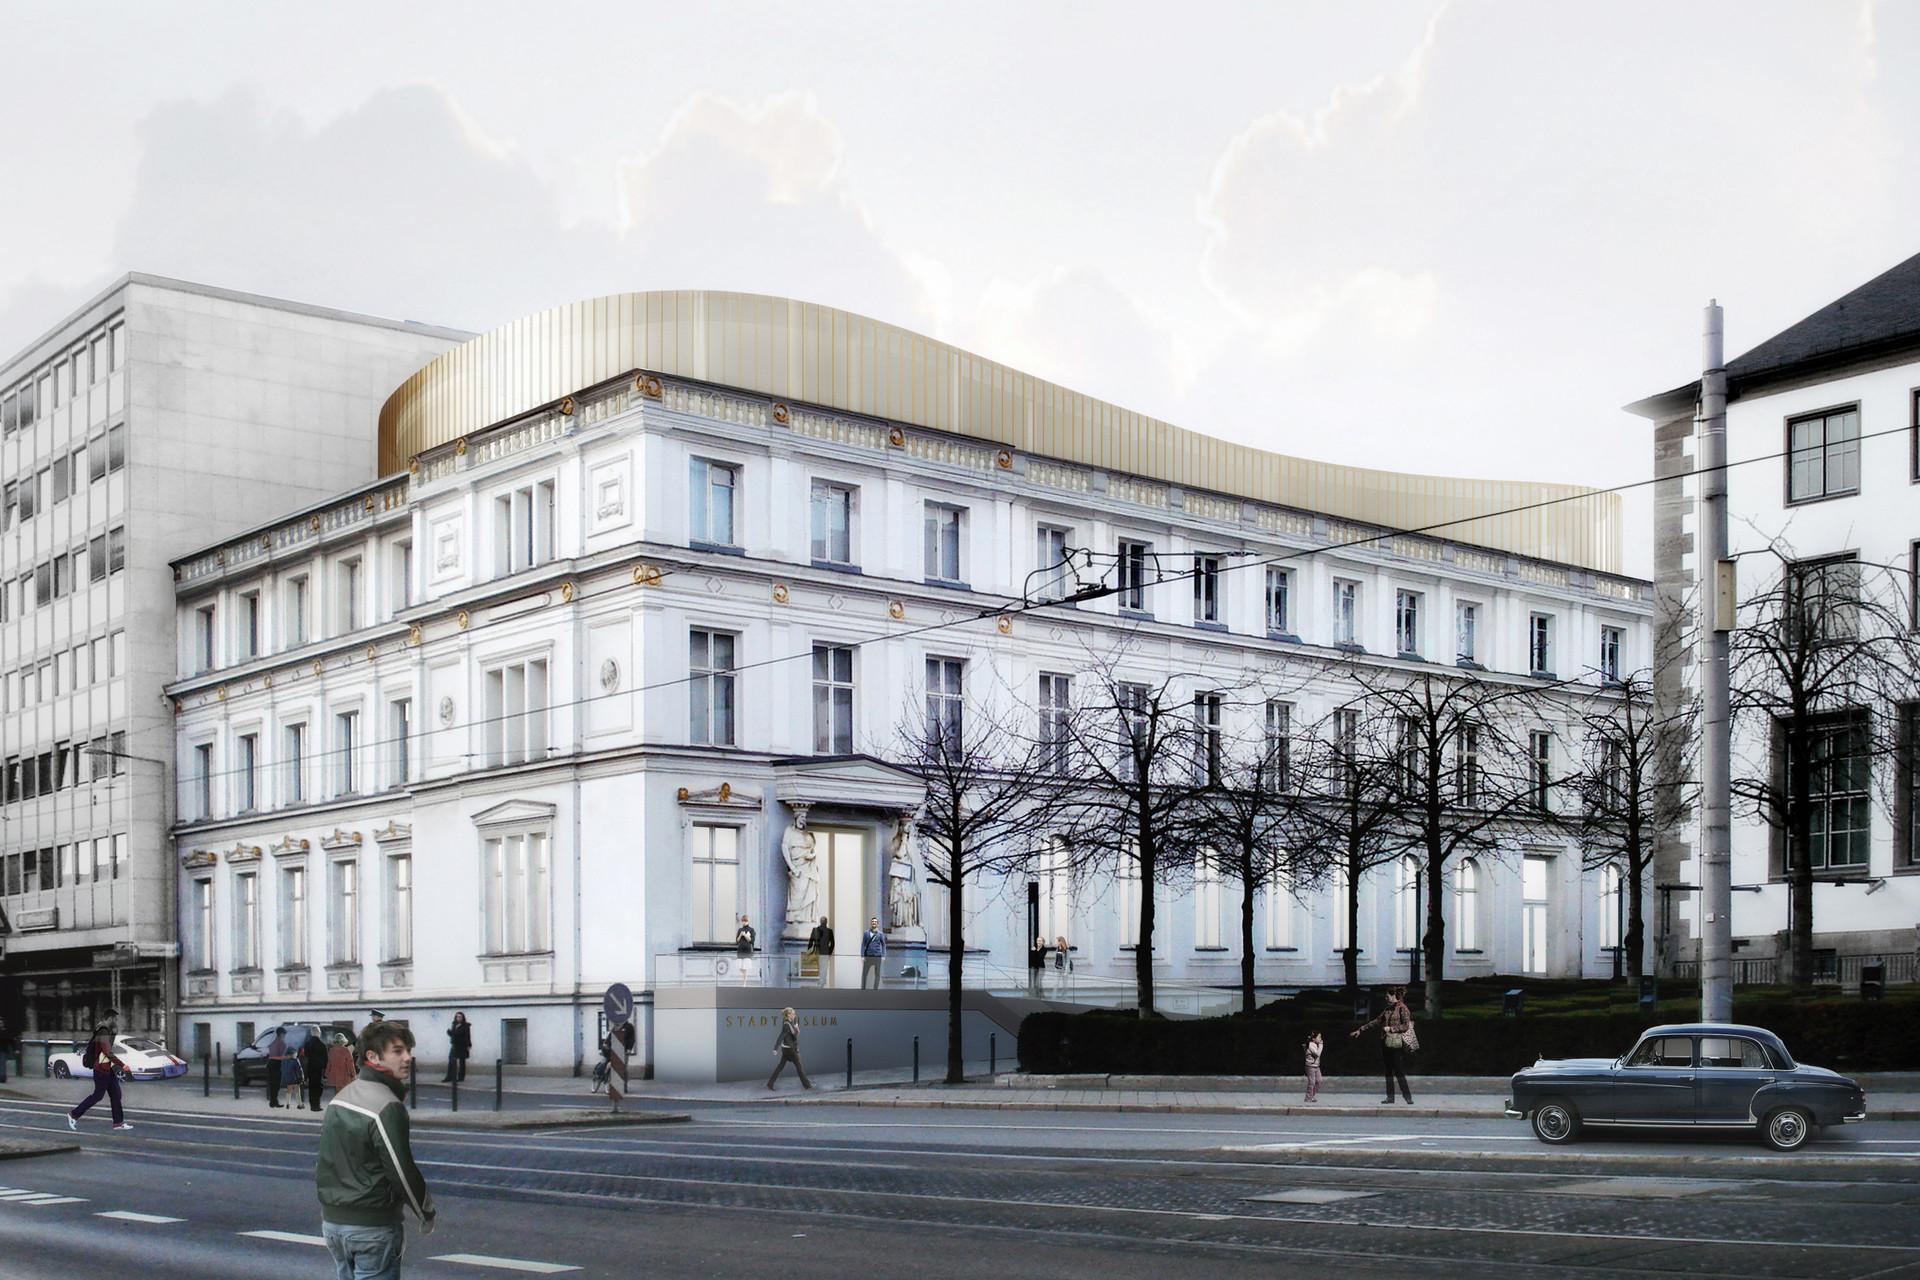 Erweiterung Stadtmuseum Kassel © Thomas Stadler